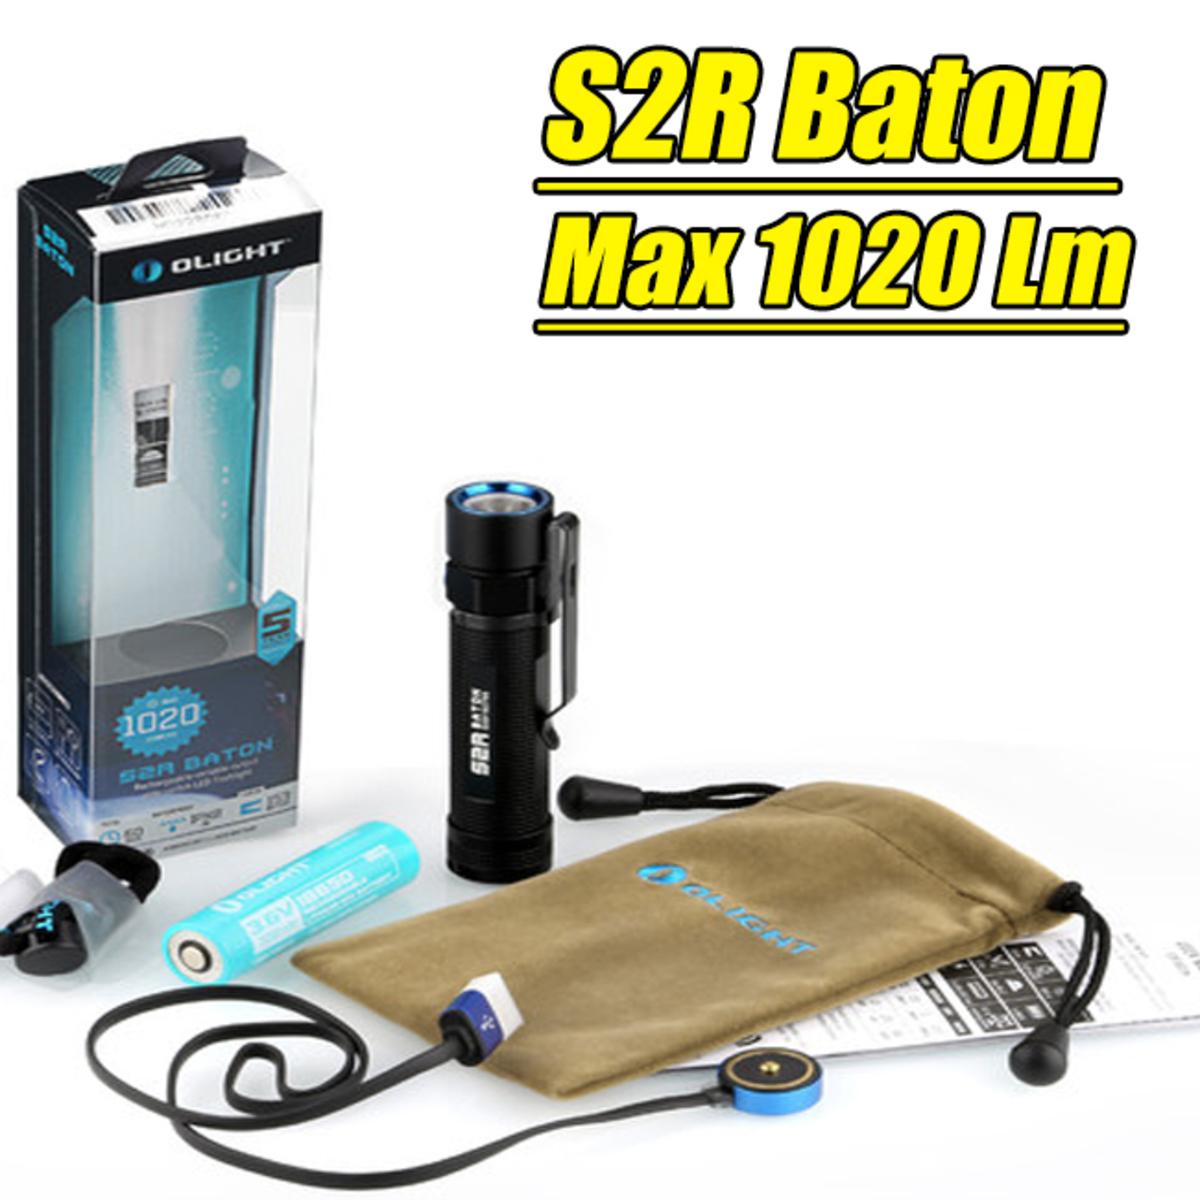 S2R Baton Flashlight 1020LM USB Charge 18650 Li-ion Battery HK Warranty